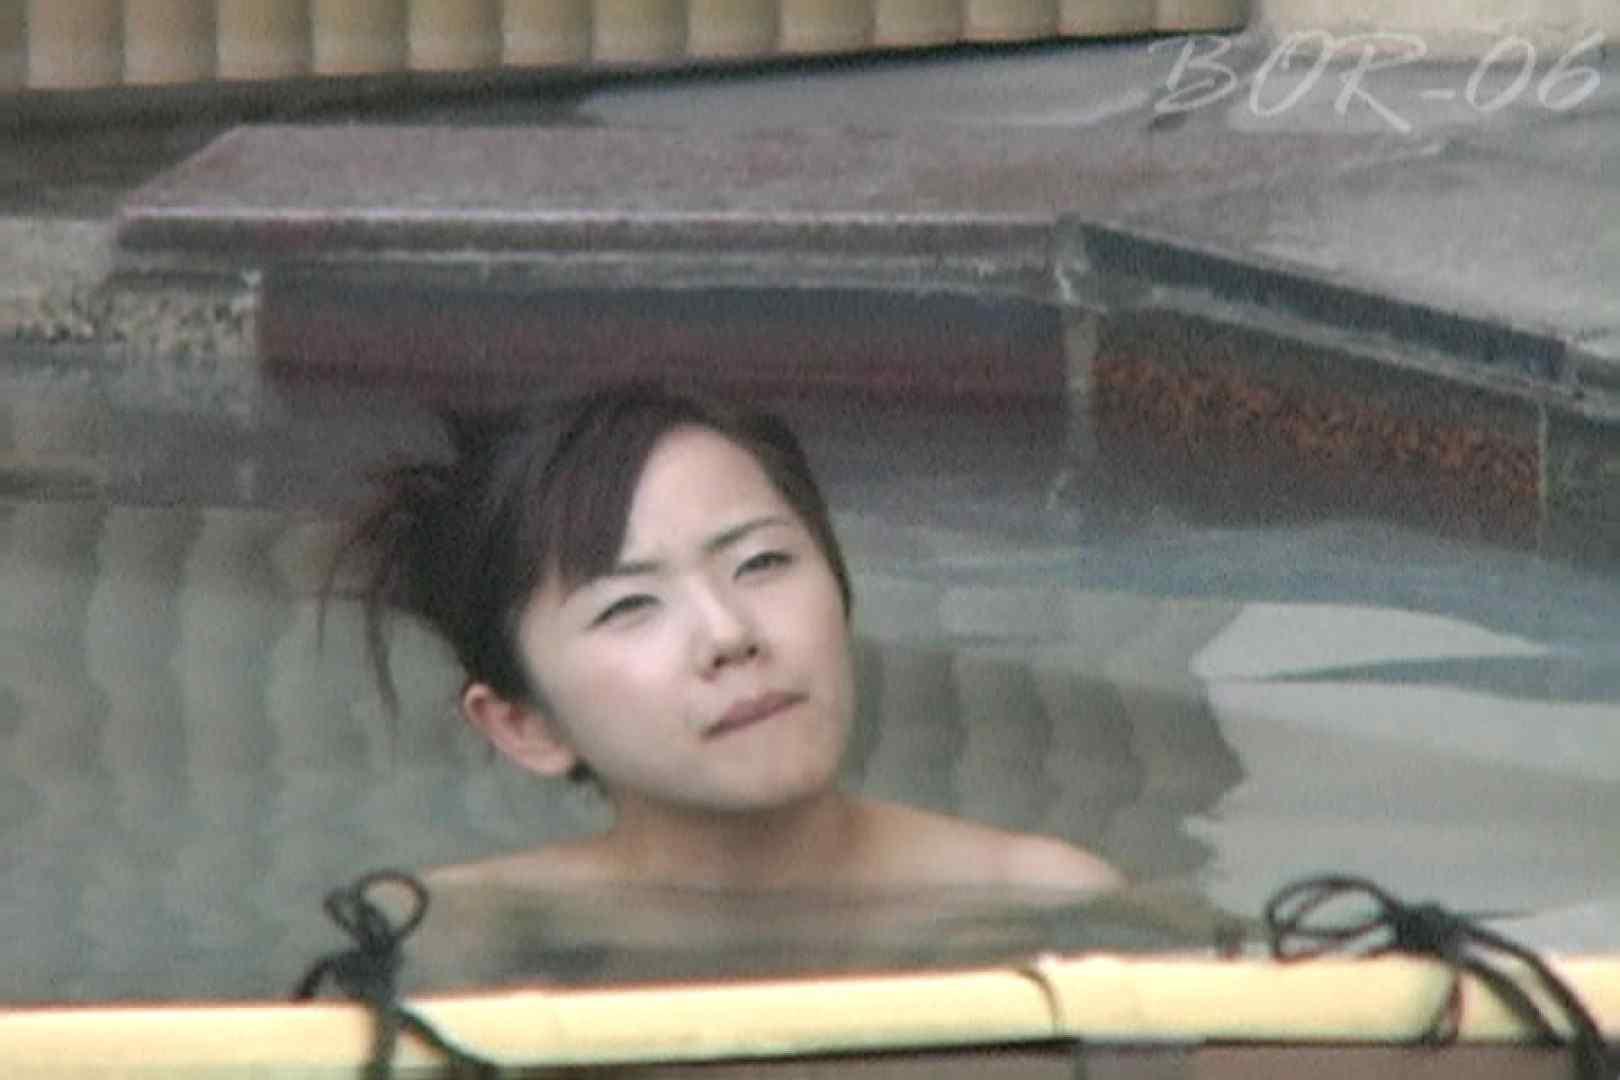 Aquaな露天風呂Vol.521 露天 おめこ無修正動画無料 92画像 56